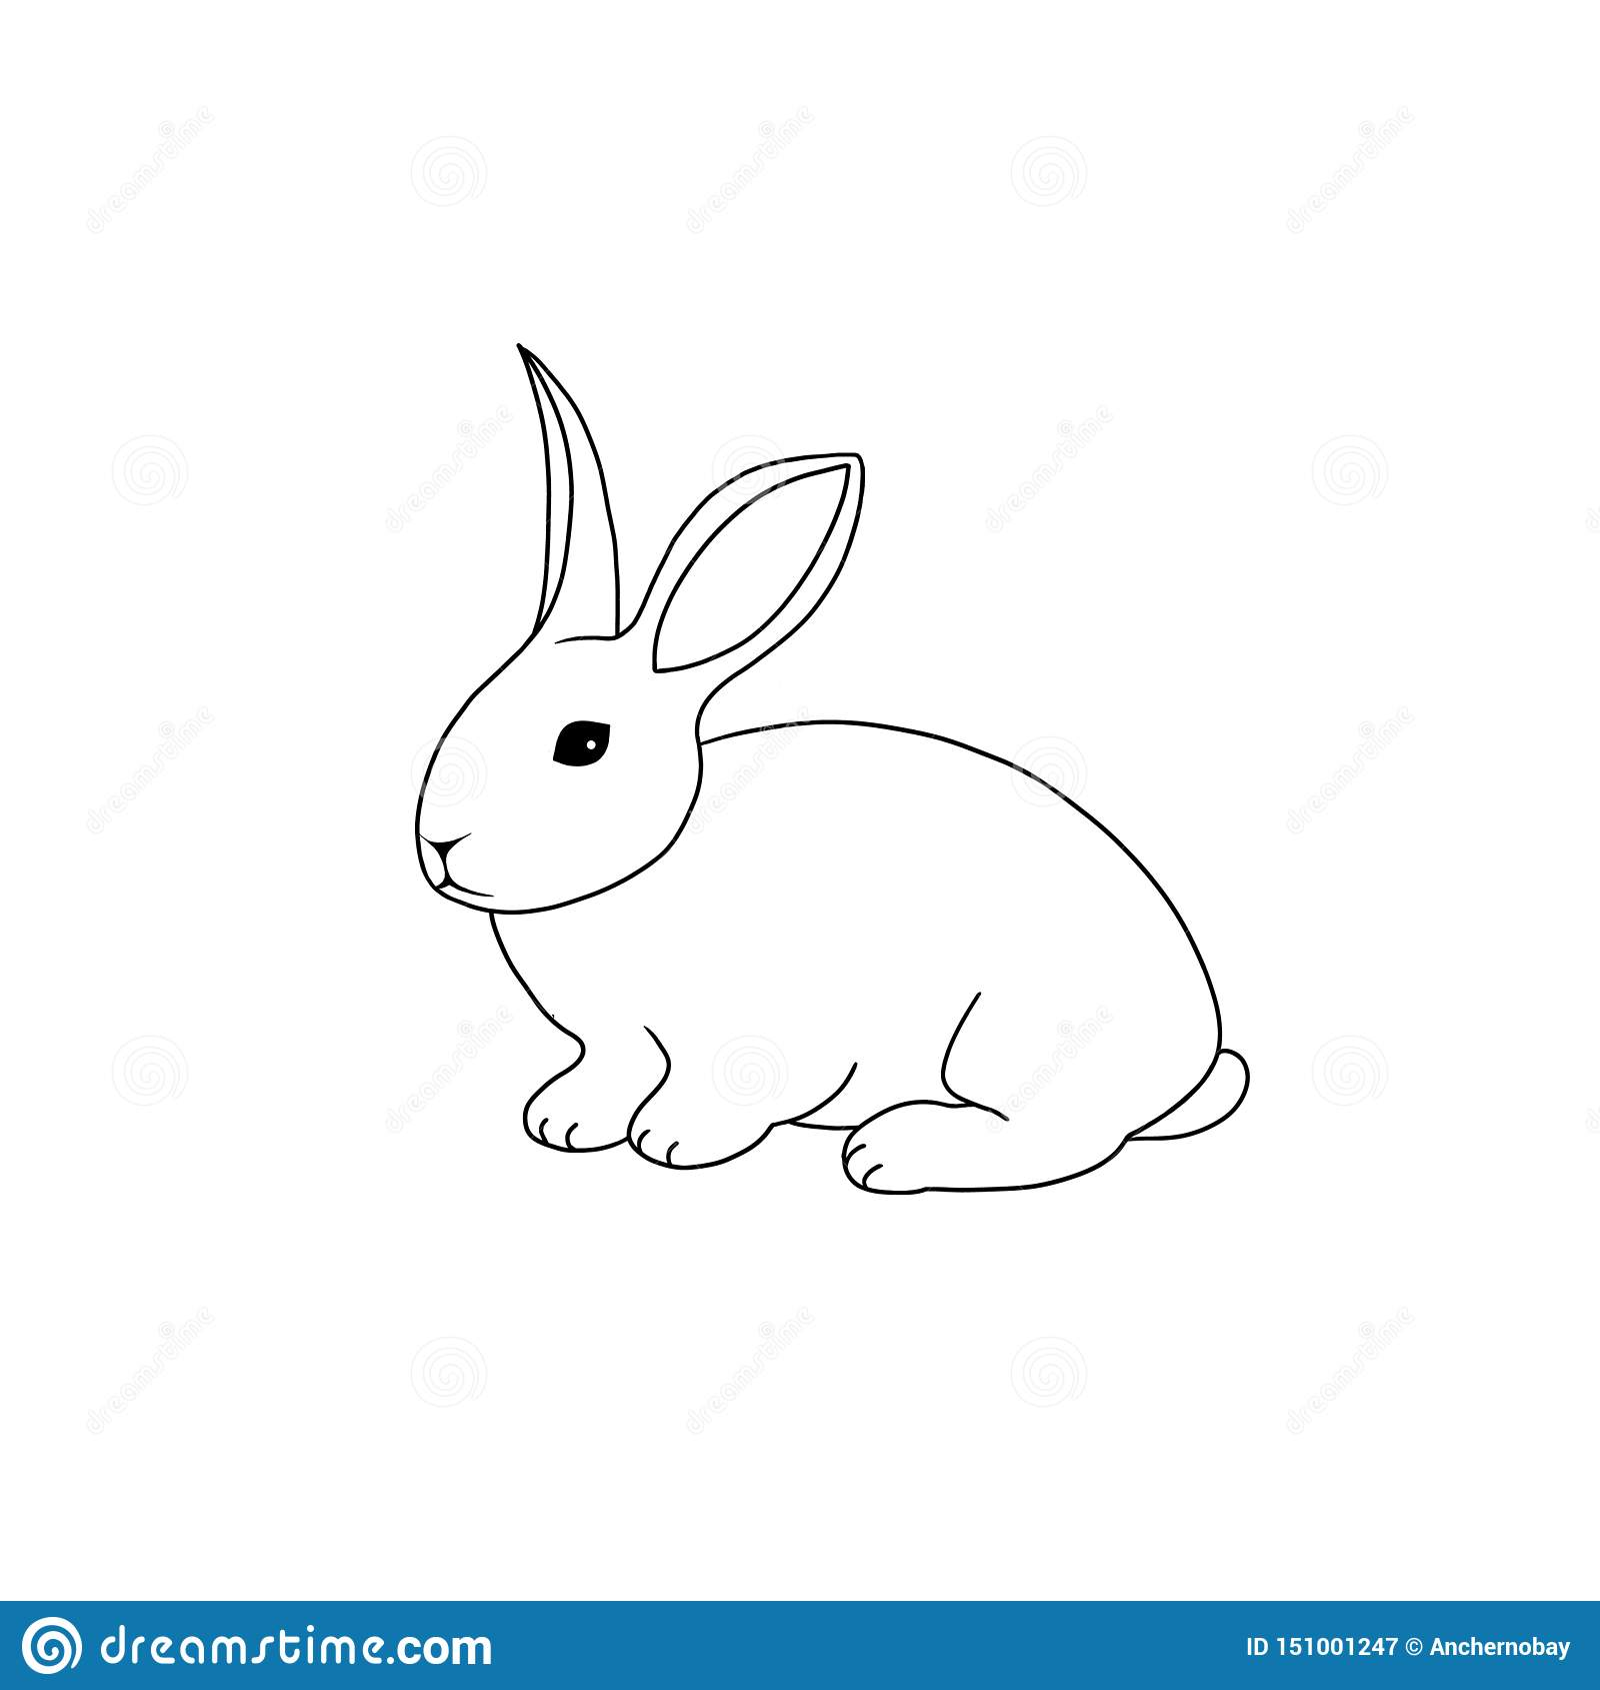 Line art farm animal rabbit hand drawn illustration isolated on white background